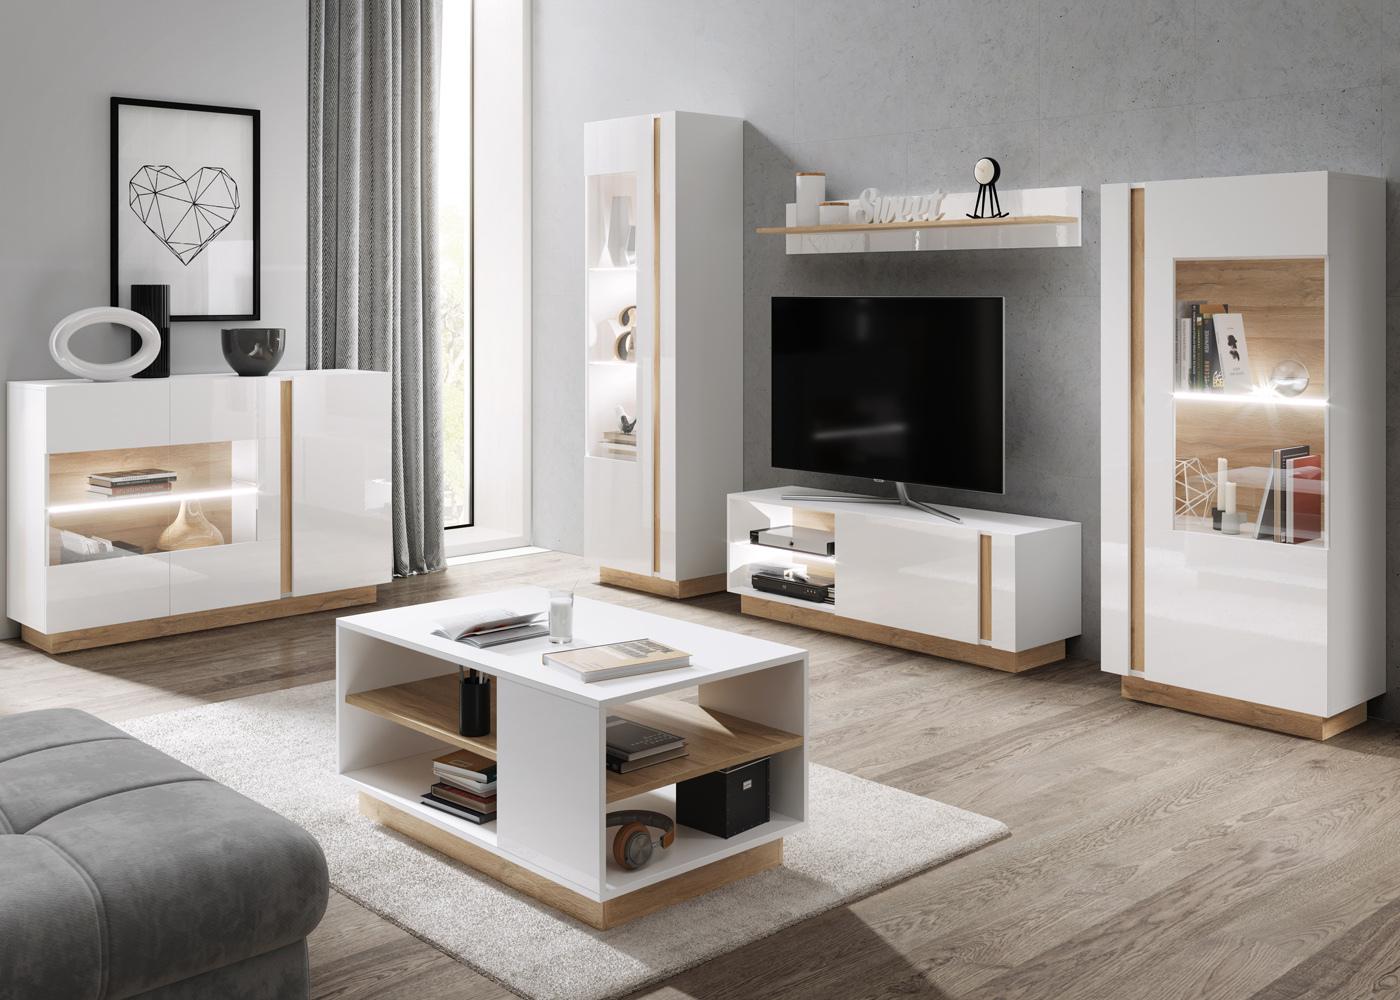 skoky 4 piece living room furniture set white oak